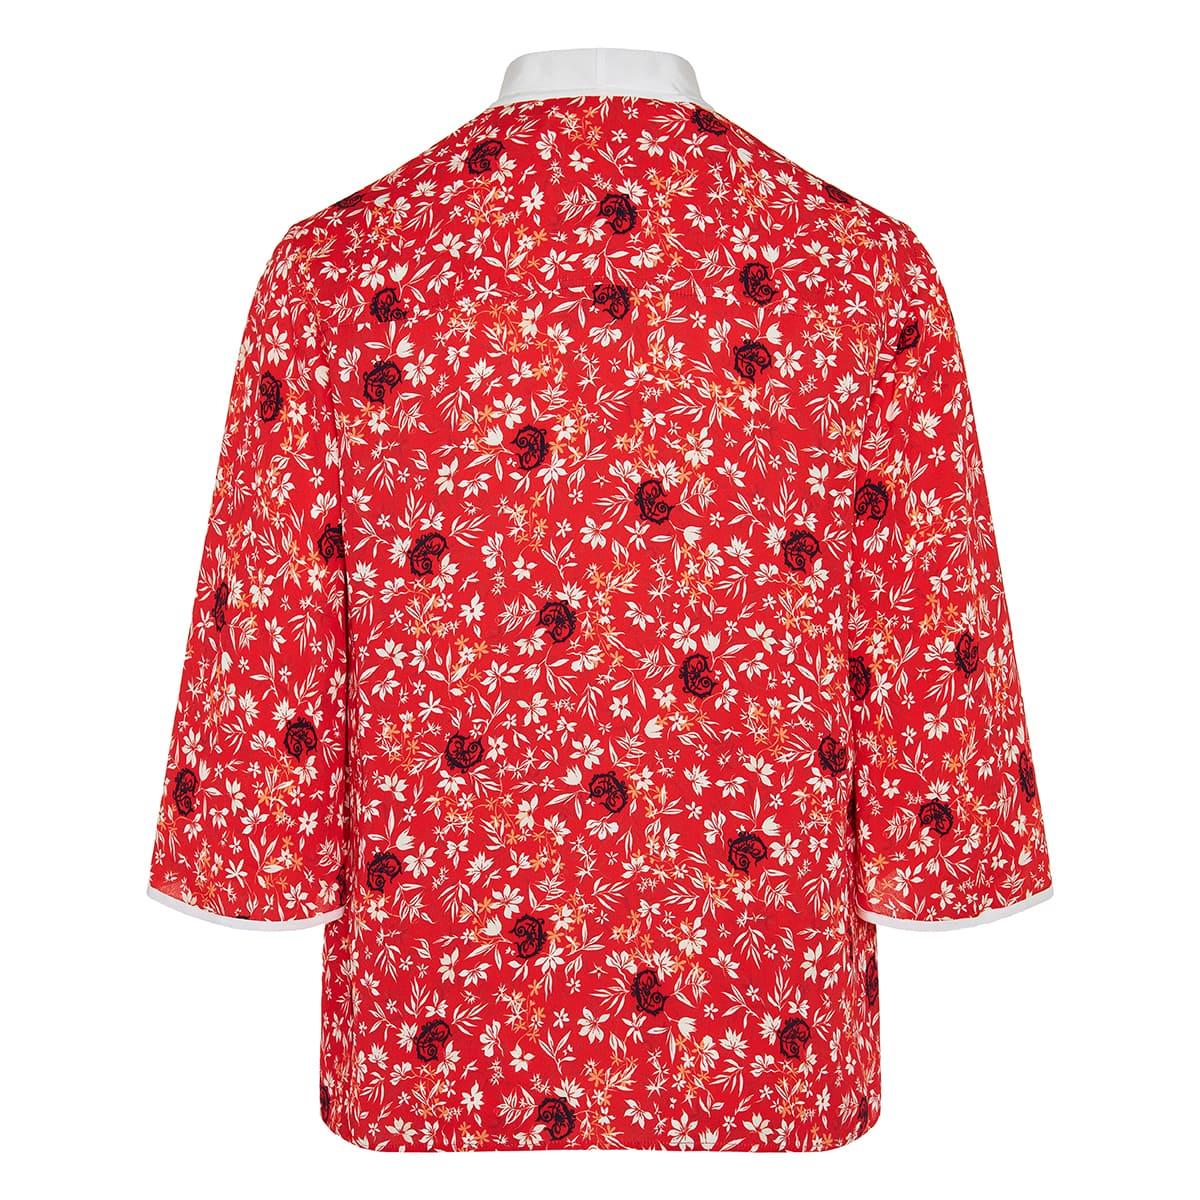 C floral bow-tie shirt